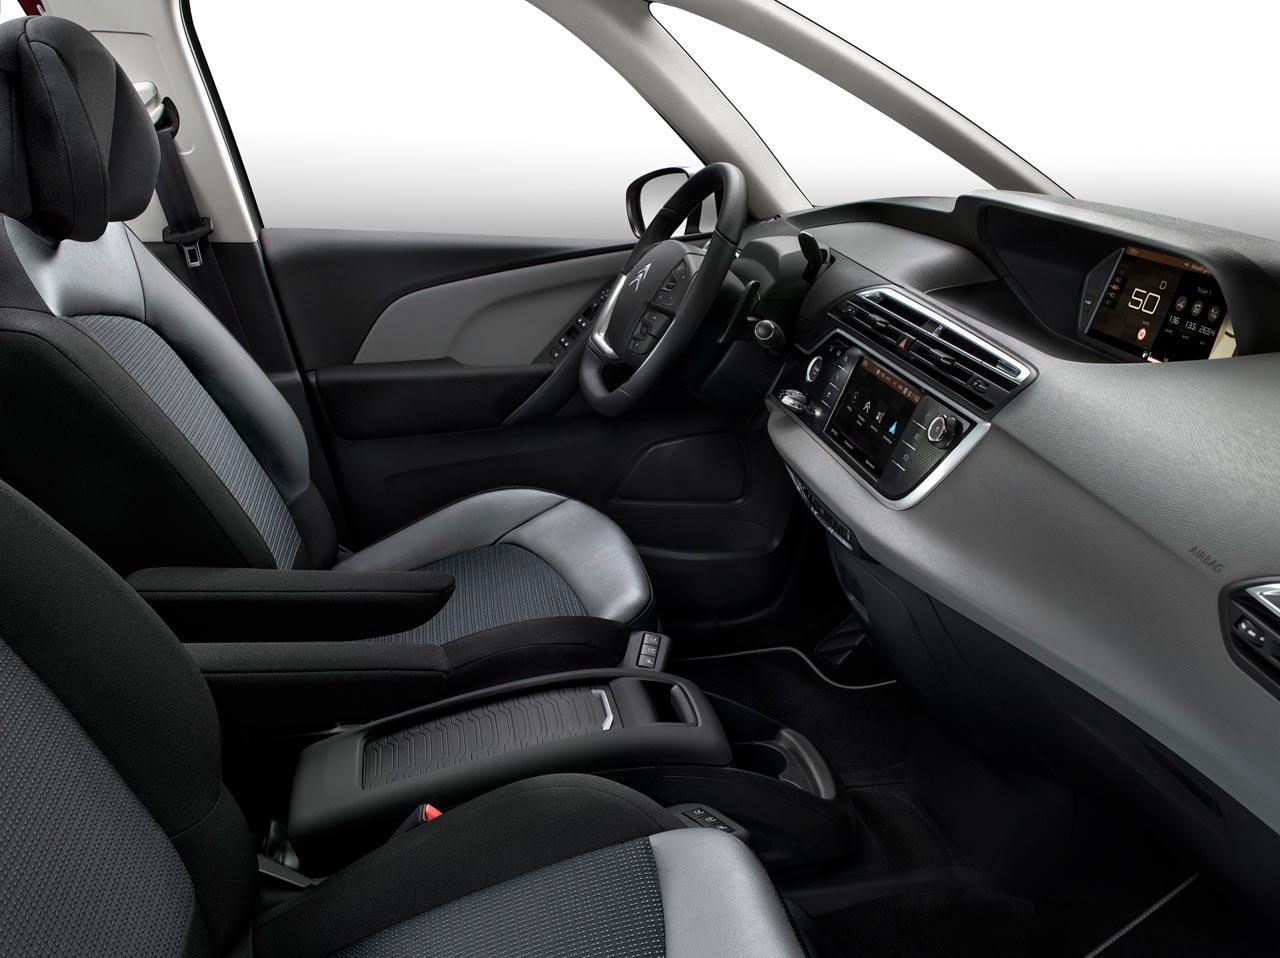 Interior Citroën C4 Picasso